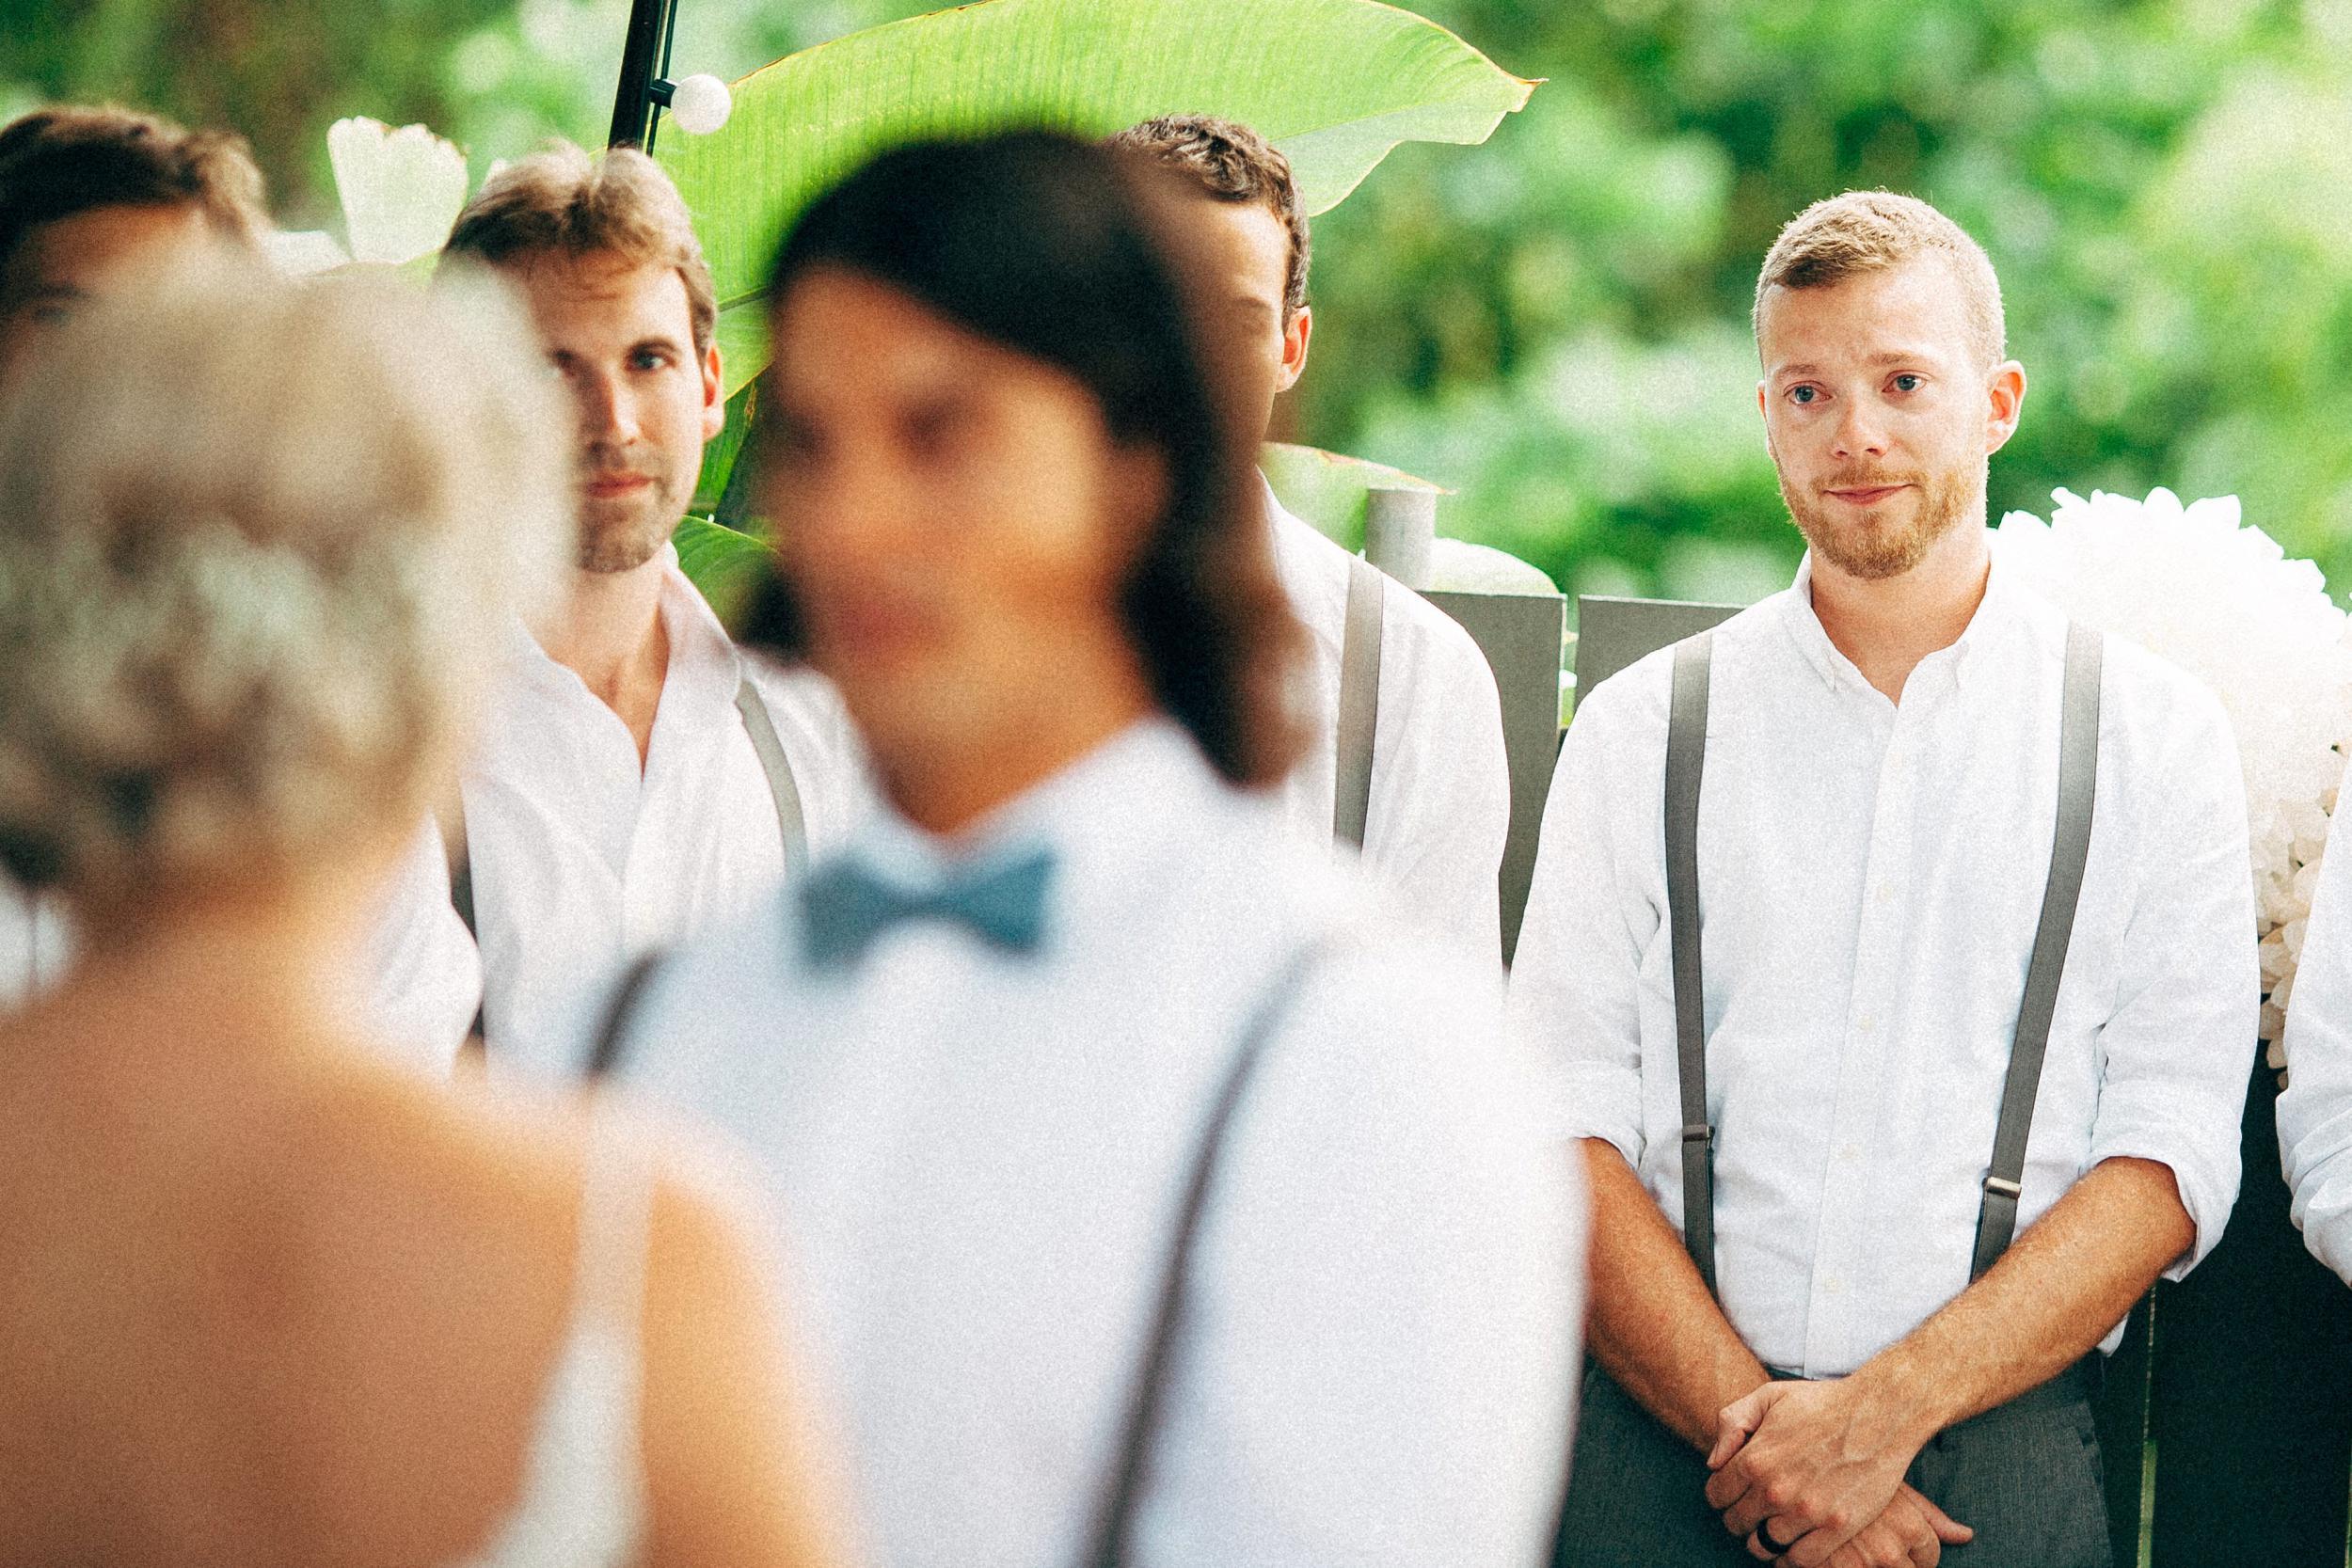 honolulu-hawaii-elopement-wedding-photographer_0078.jpg